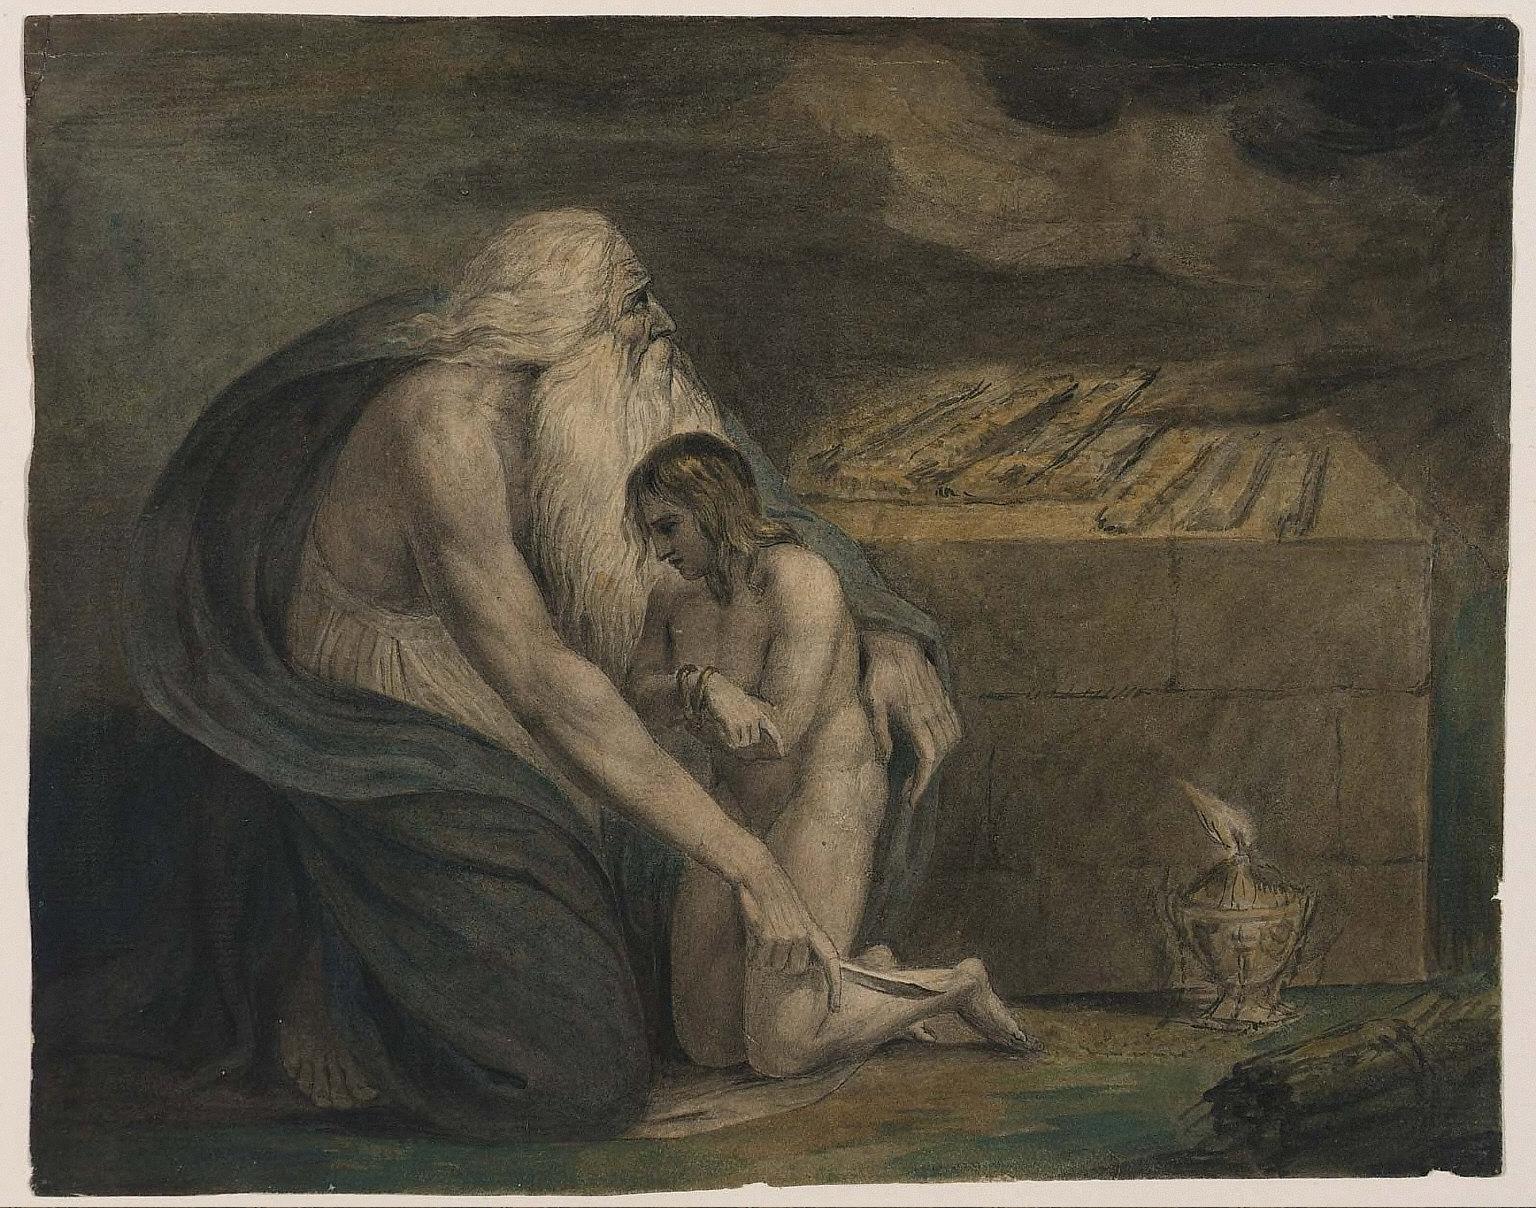 Abraham Preparing to Sacrifice Isaac (Genesis, XXII, 9-12)